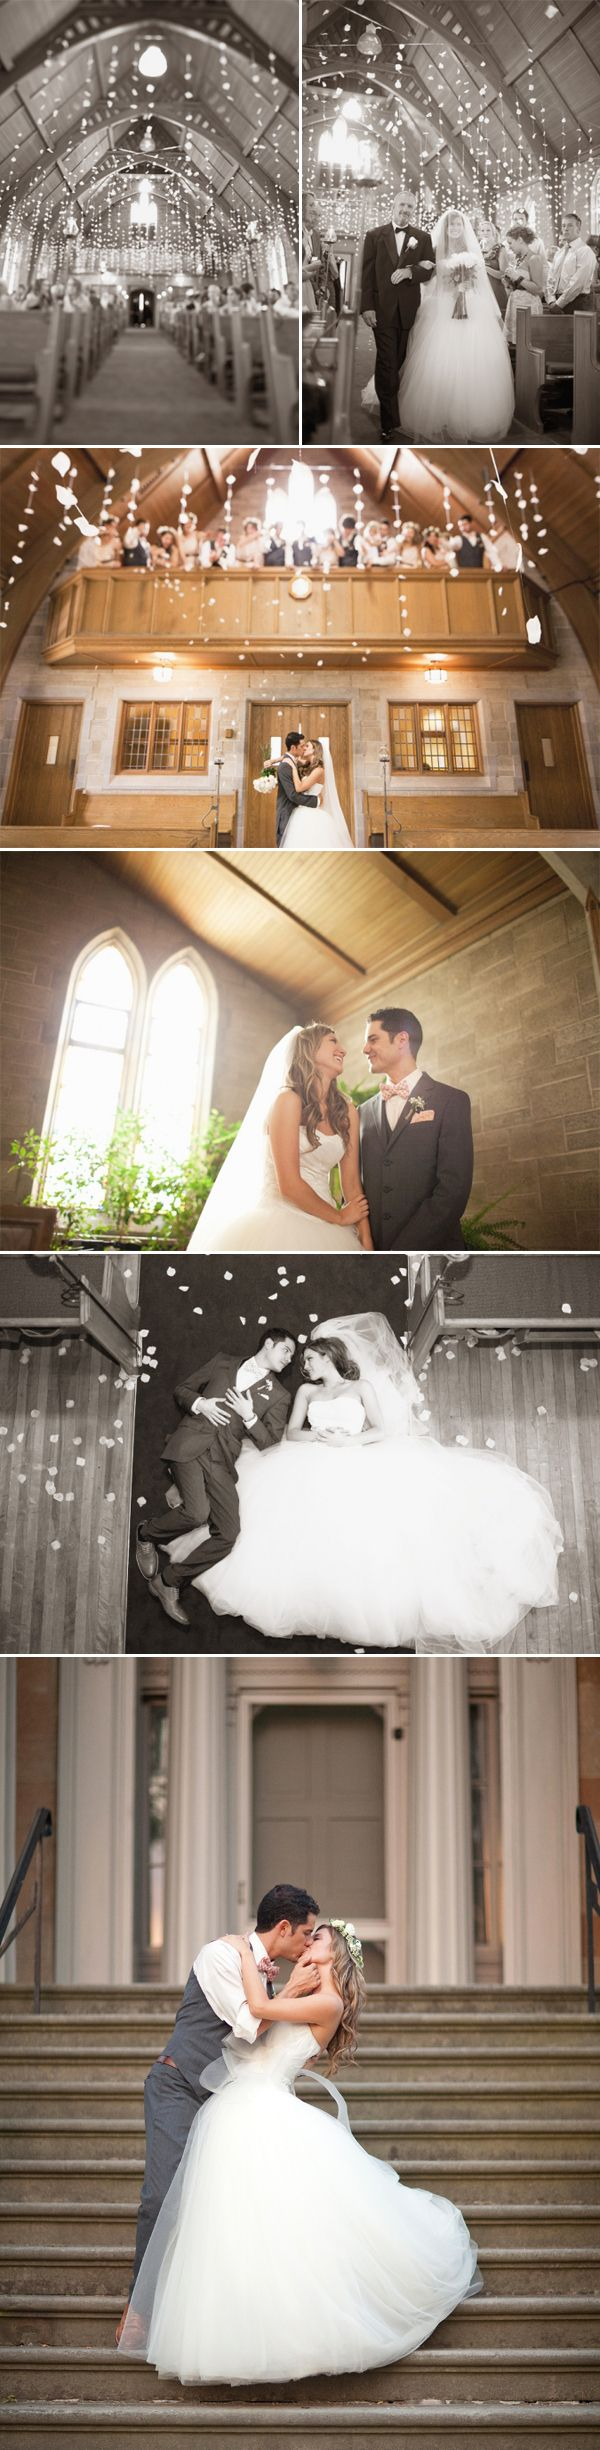 Romantic Southern Ontario Wedding